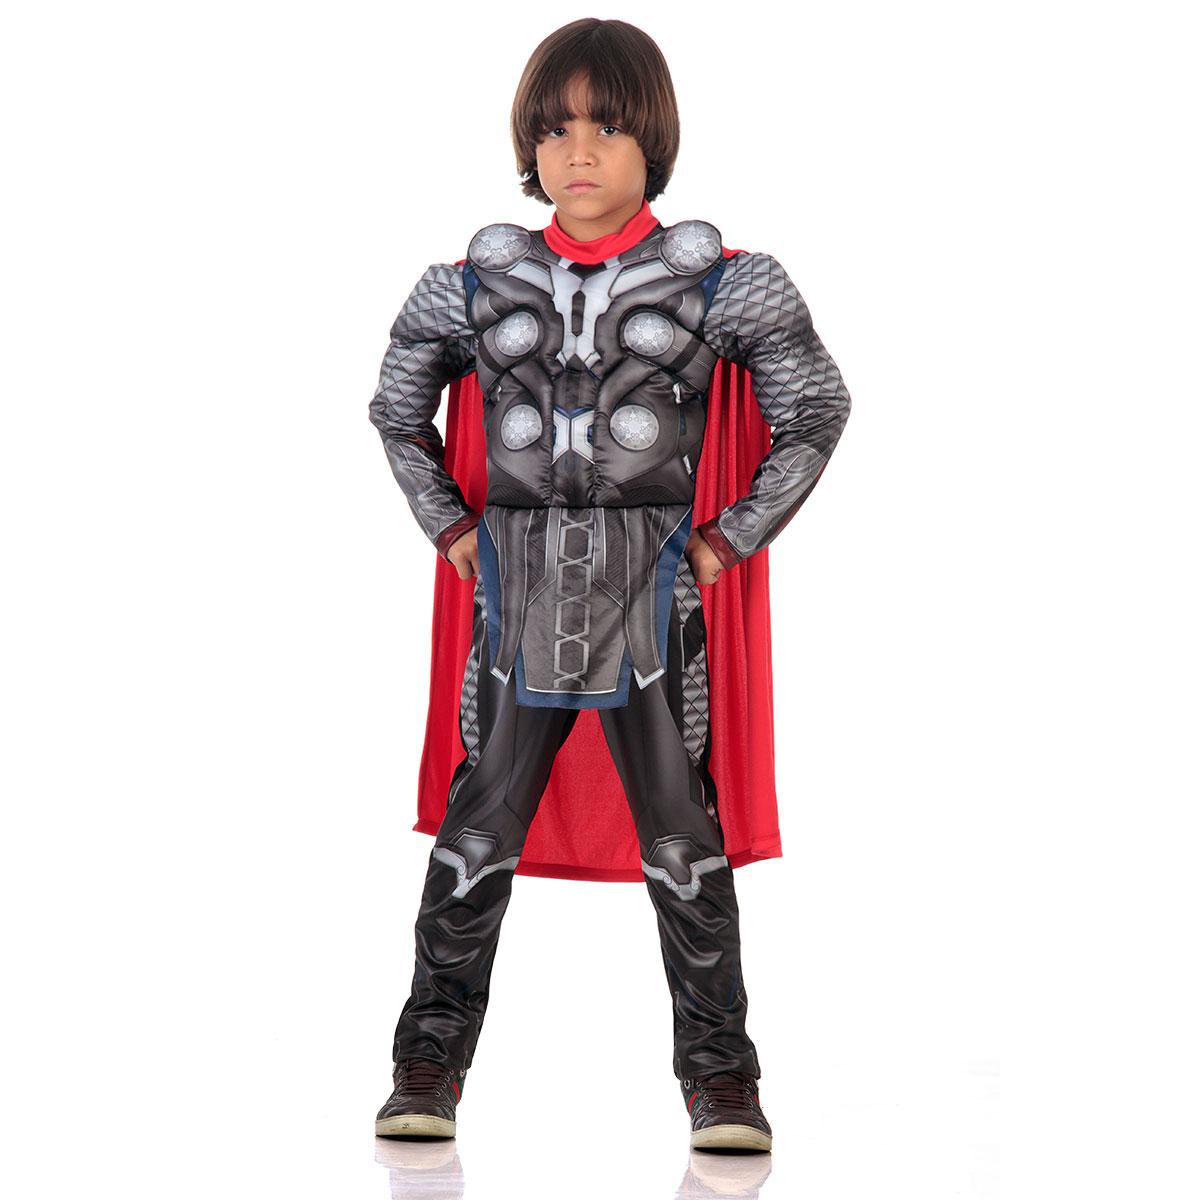 Fantasia Thor Com Peitoral Infantil Luxo - Cosplay Avengers - Abrakadabra